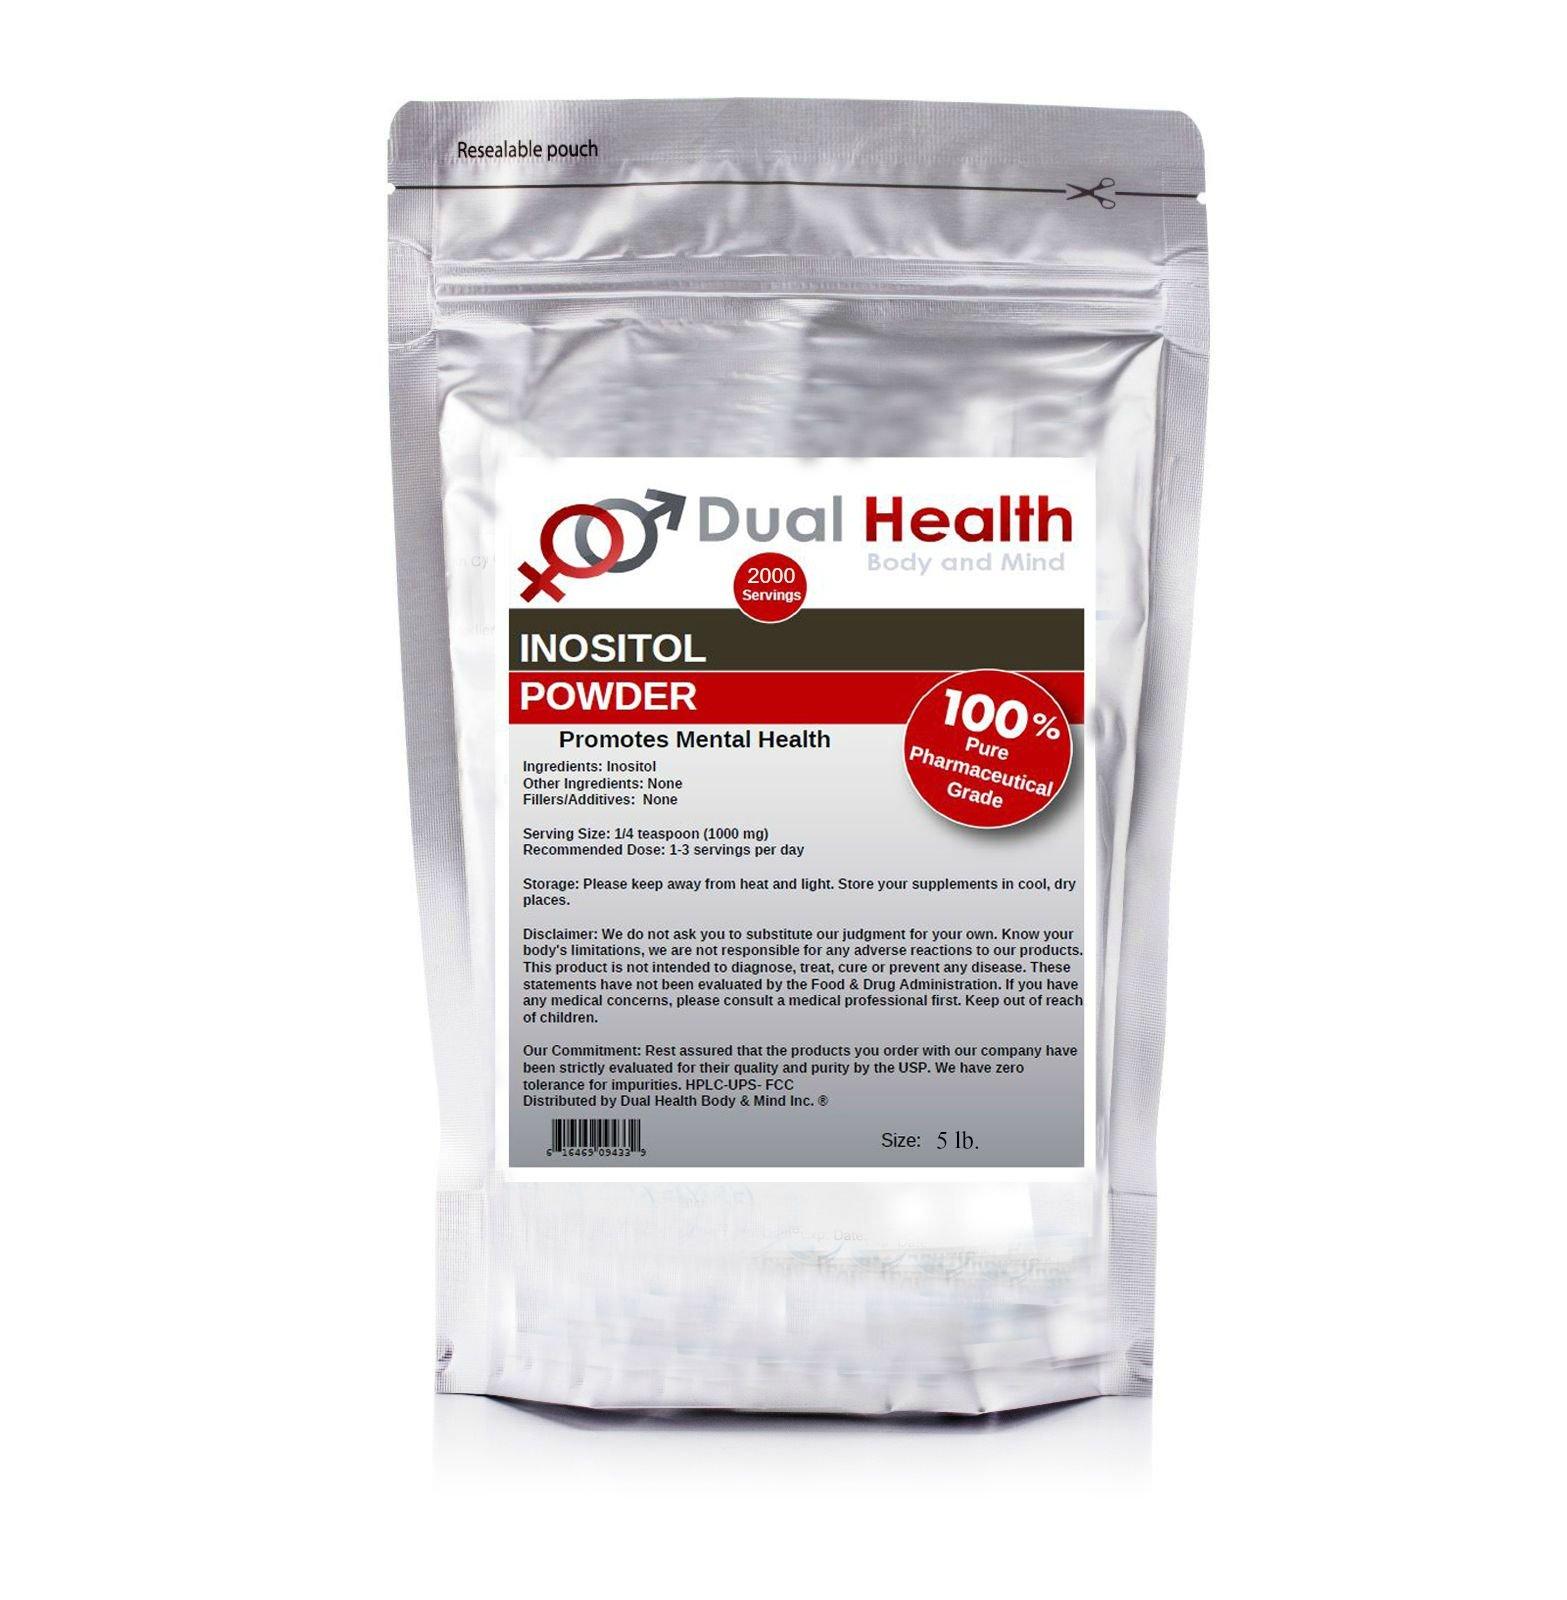 Pure Inositol Powder (5 lb) Bulk Supplements by Dual Health Body & Mind